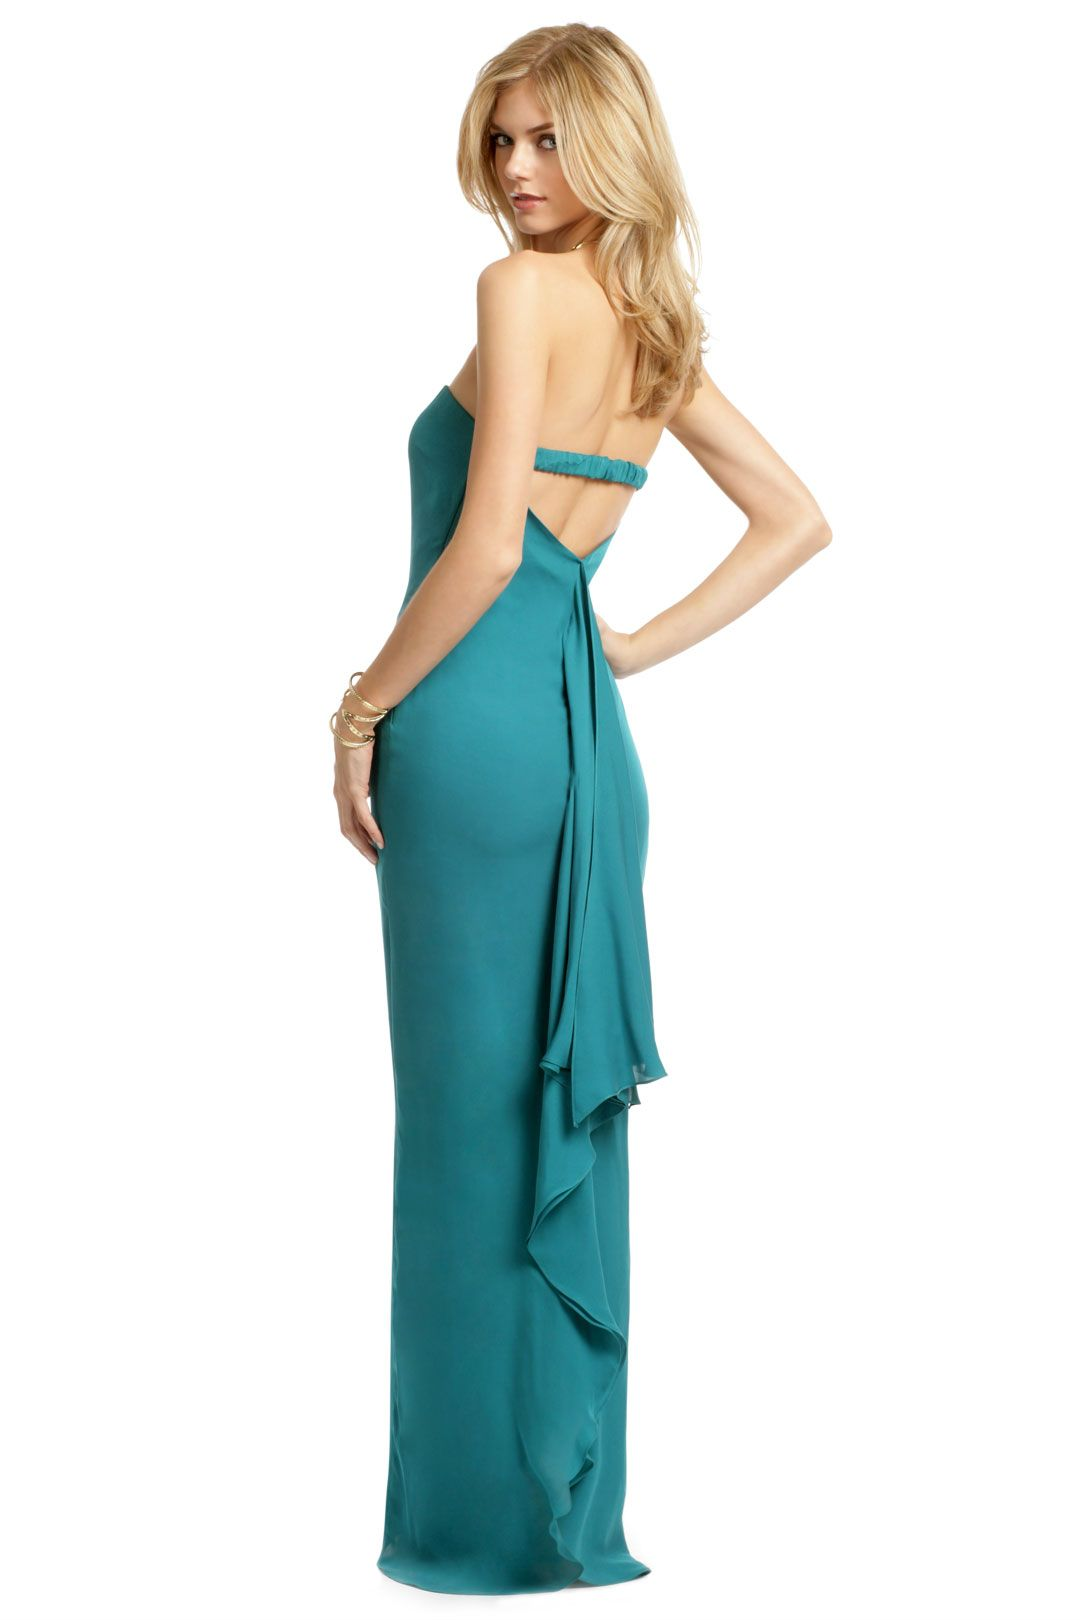 Rent designer wedding dress  Mykonos Mermaid Gown  Wedding Ideas  Pinterest  Mermaid gown